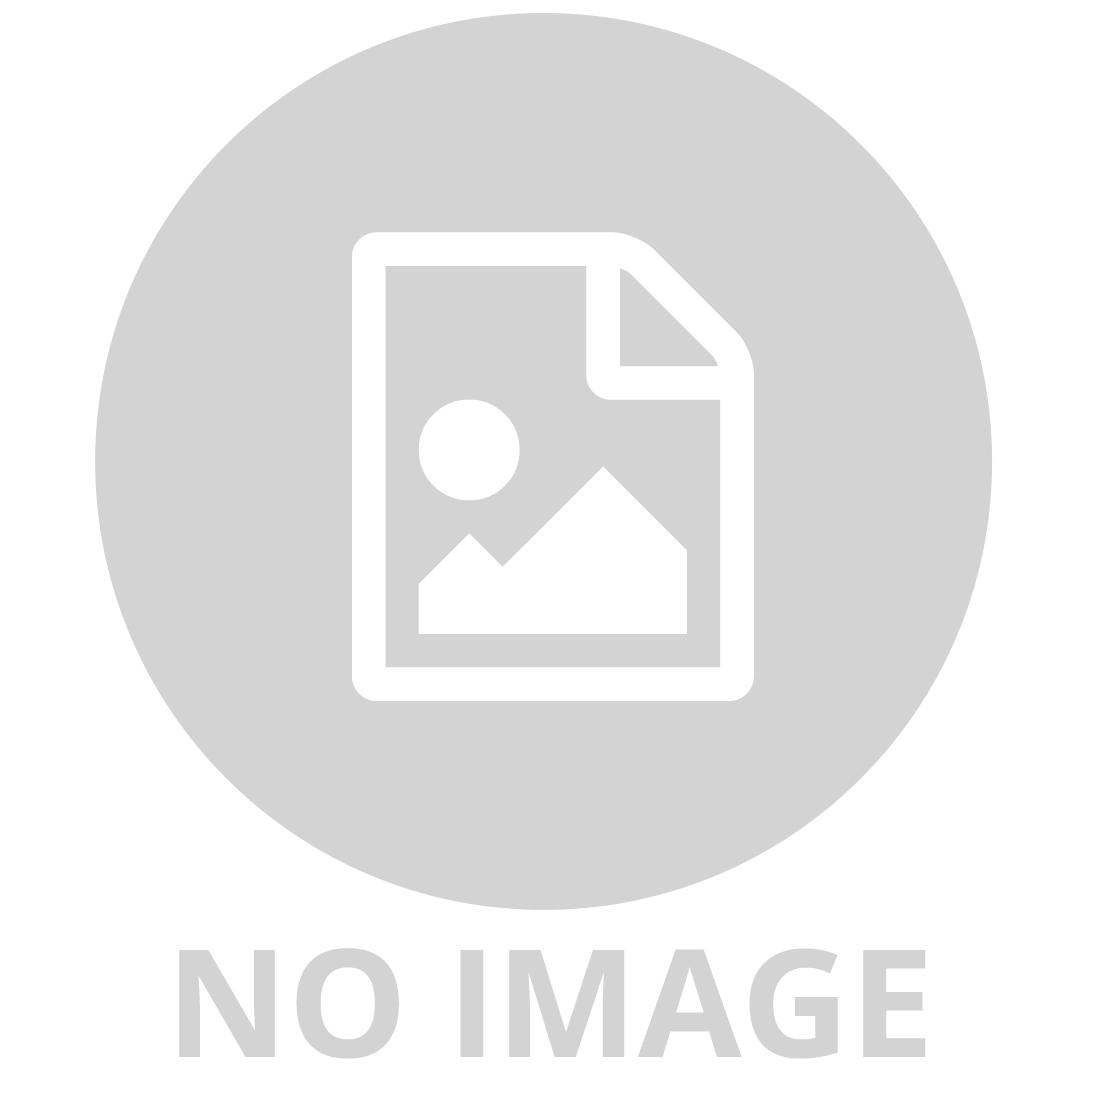 PLAYMOBIL SPIRIT 70121 MISS FLORES CLASSROOM